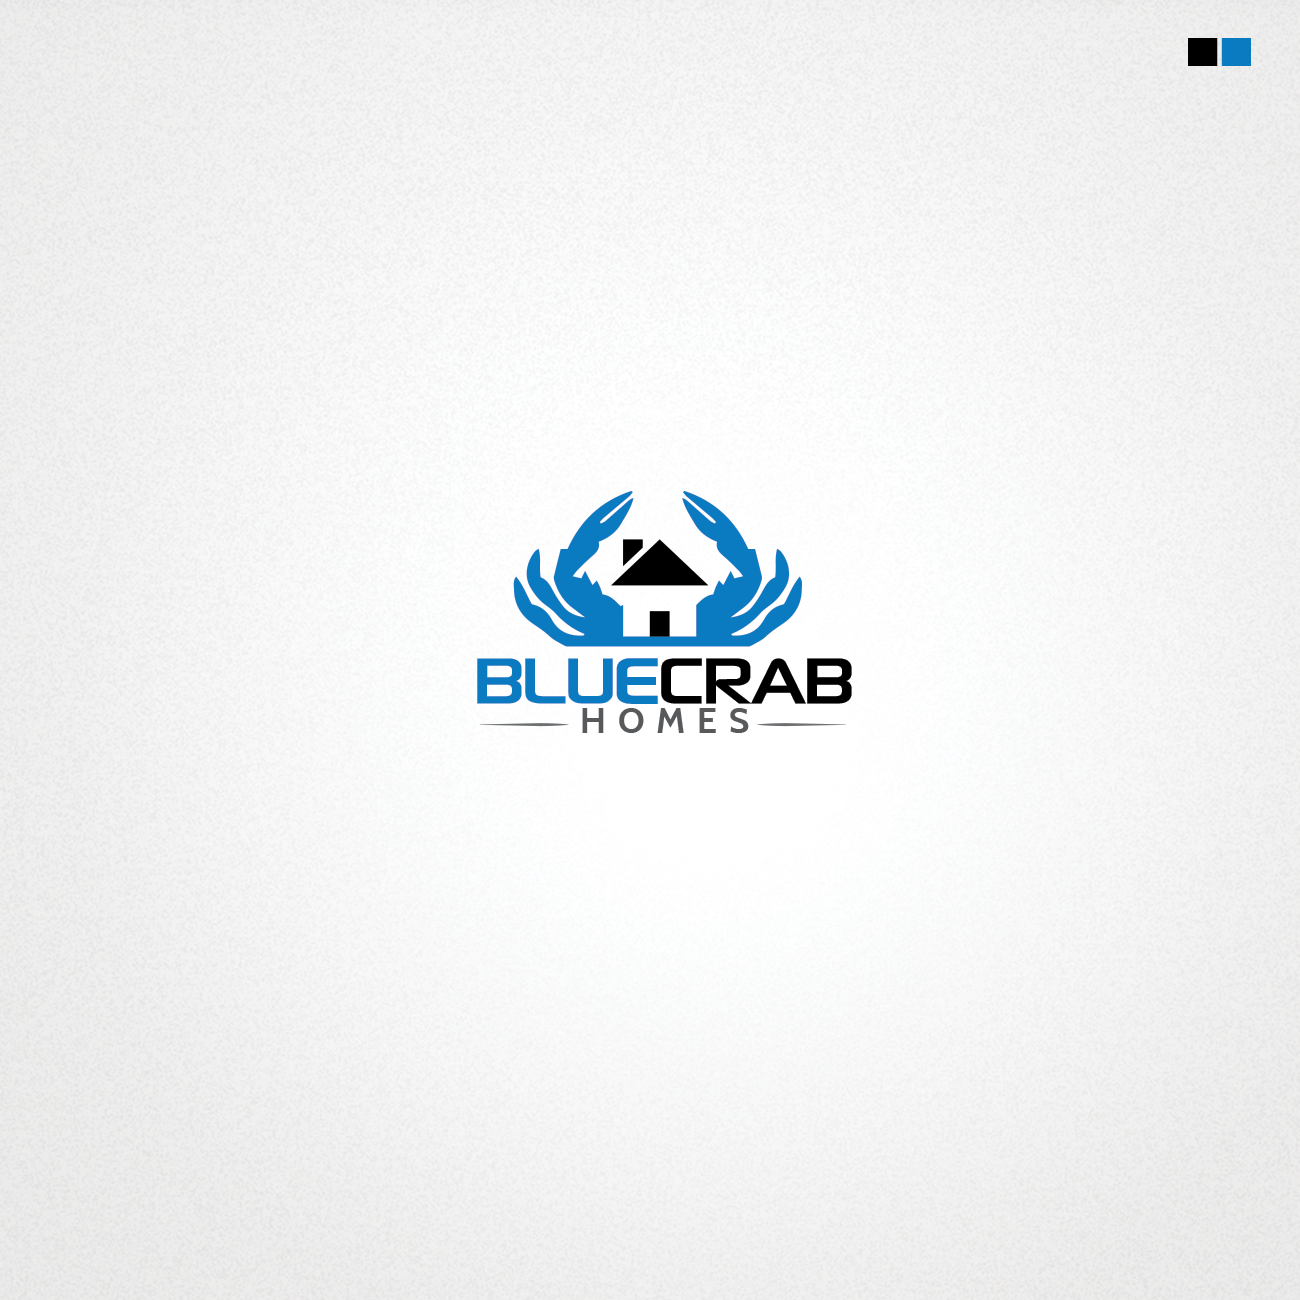 Logo Design for Steve McDonald by Graphicsbox | Design #4977900